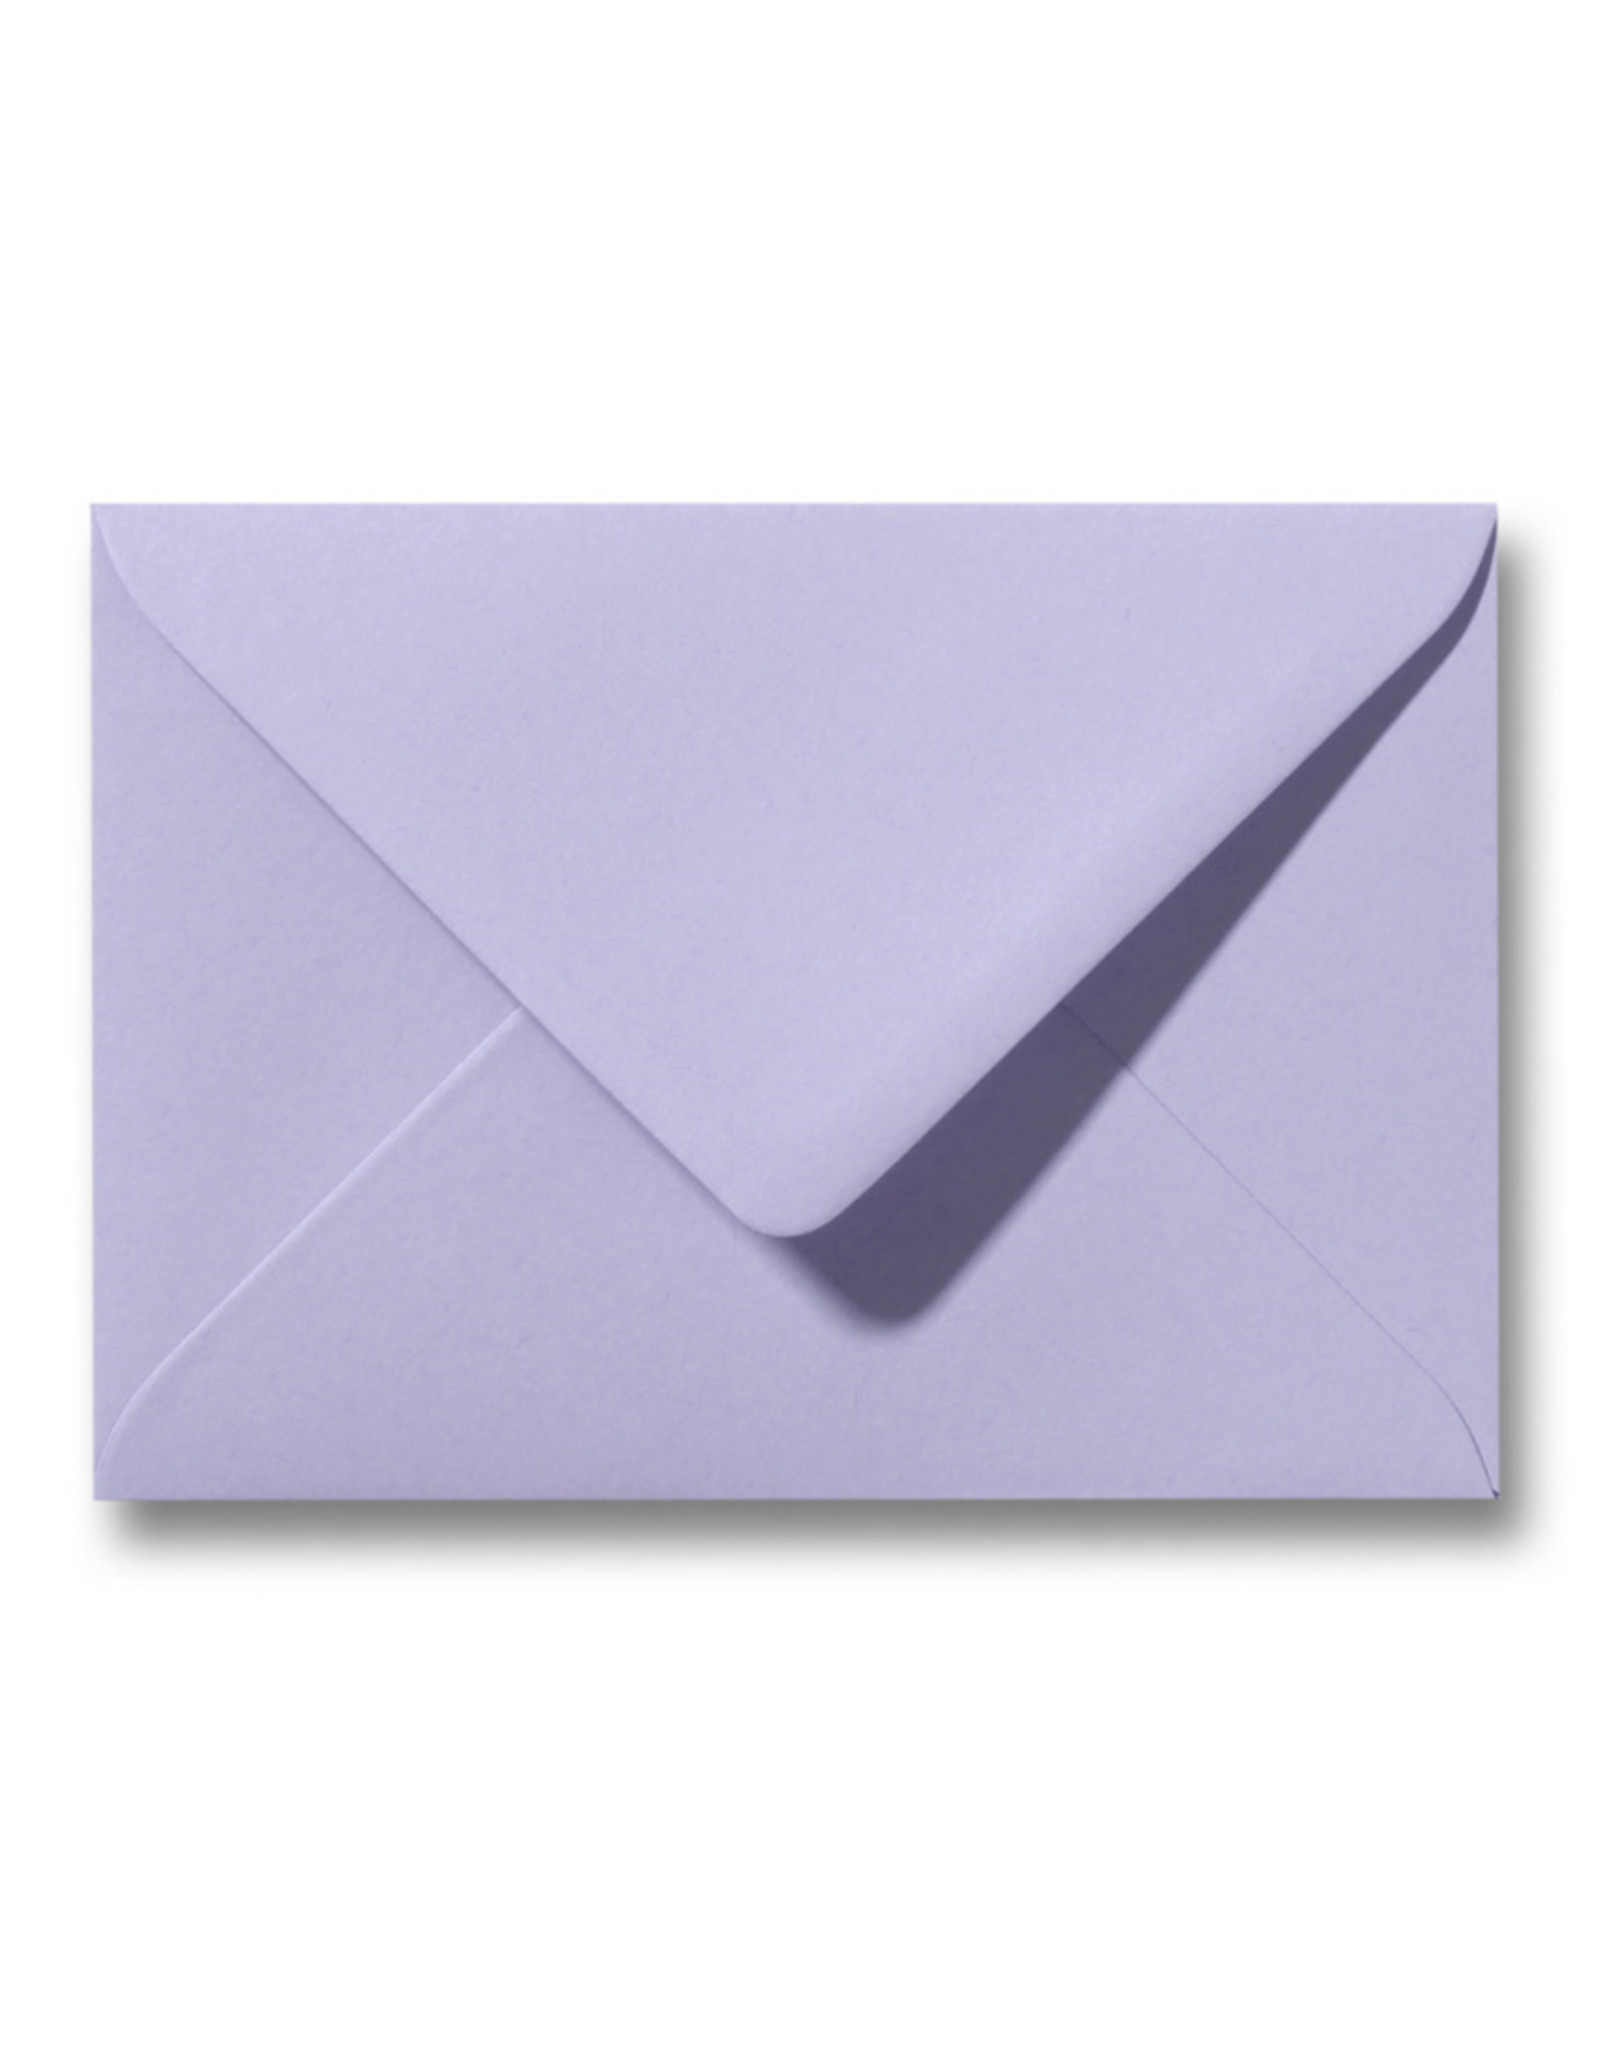 www.Robin.cards Blanco effen envelop Lavendel